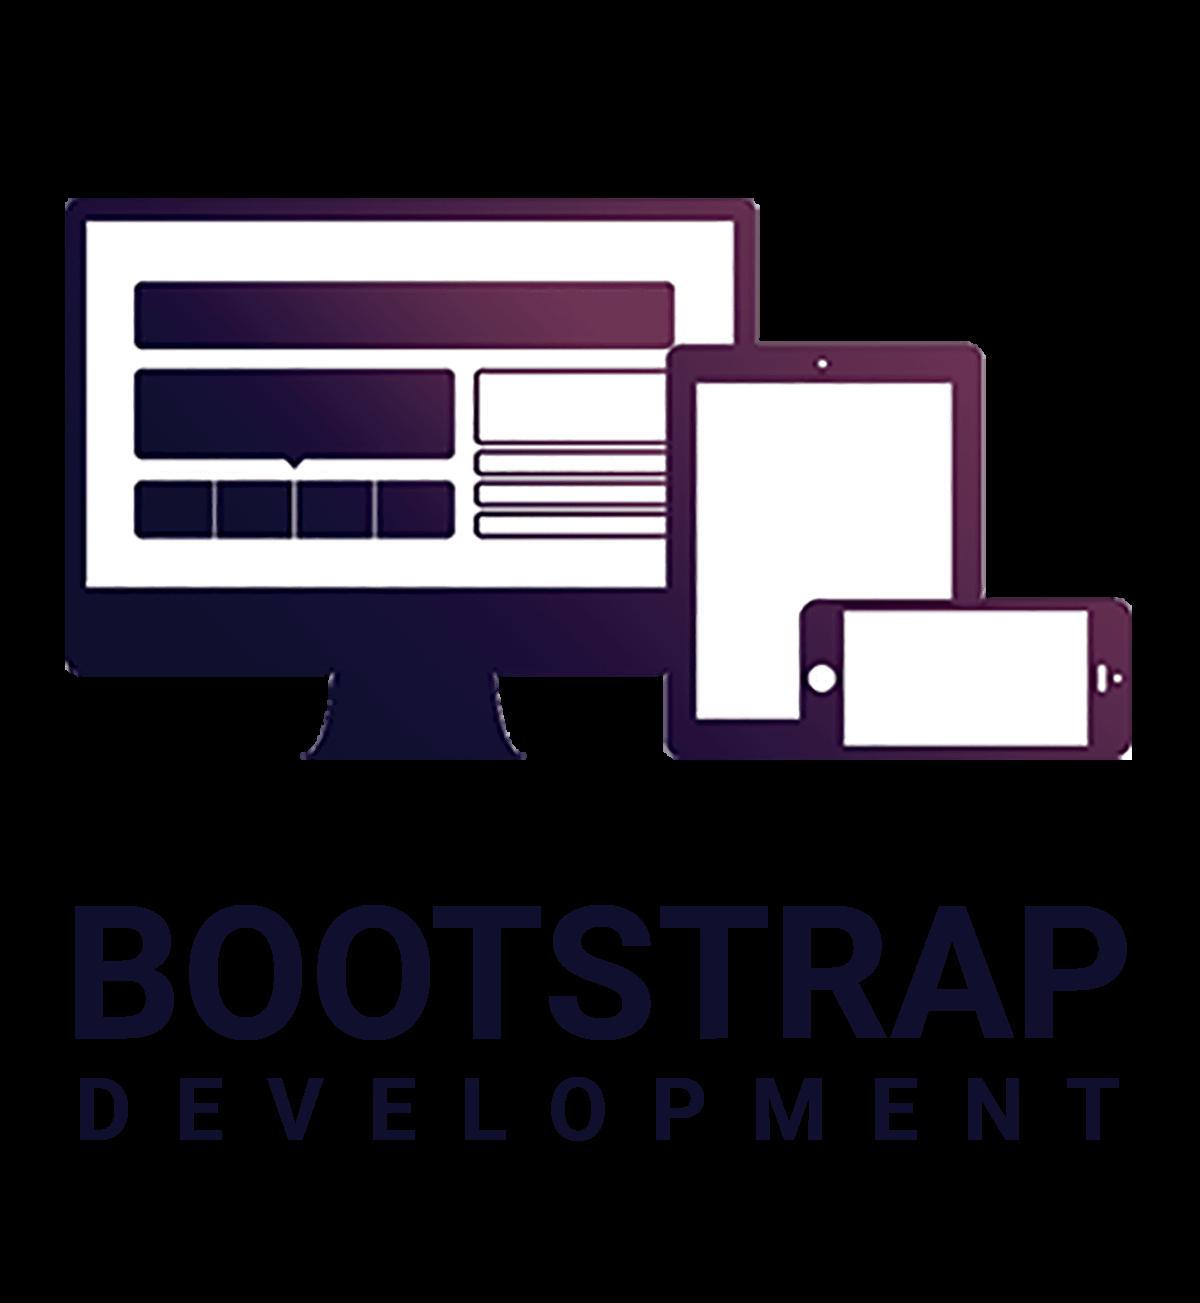 https://ml8bxbbz7pj9.i.optimole.com/kcjfi9Q.mVbO~6367f/w:auto/h:auto/q:90/https://arksstech.com/wp-content/upload/2018/06/Bootstrap.png